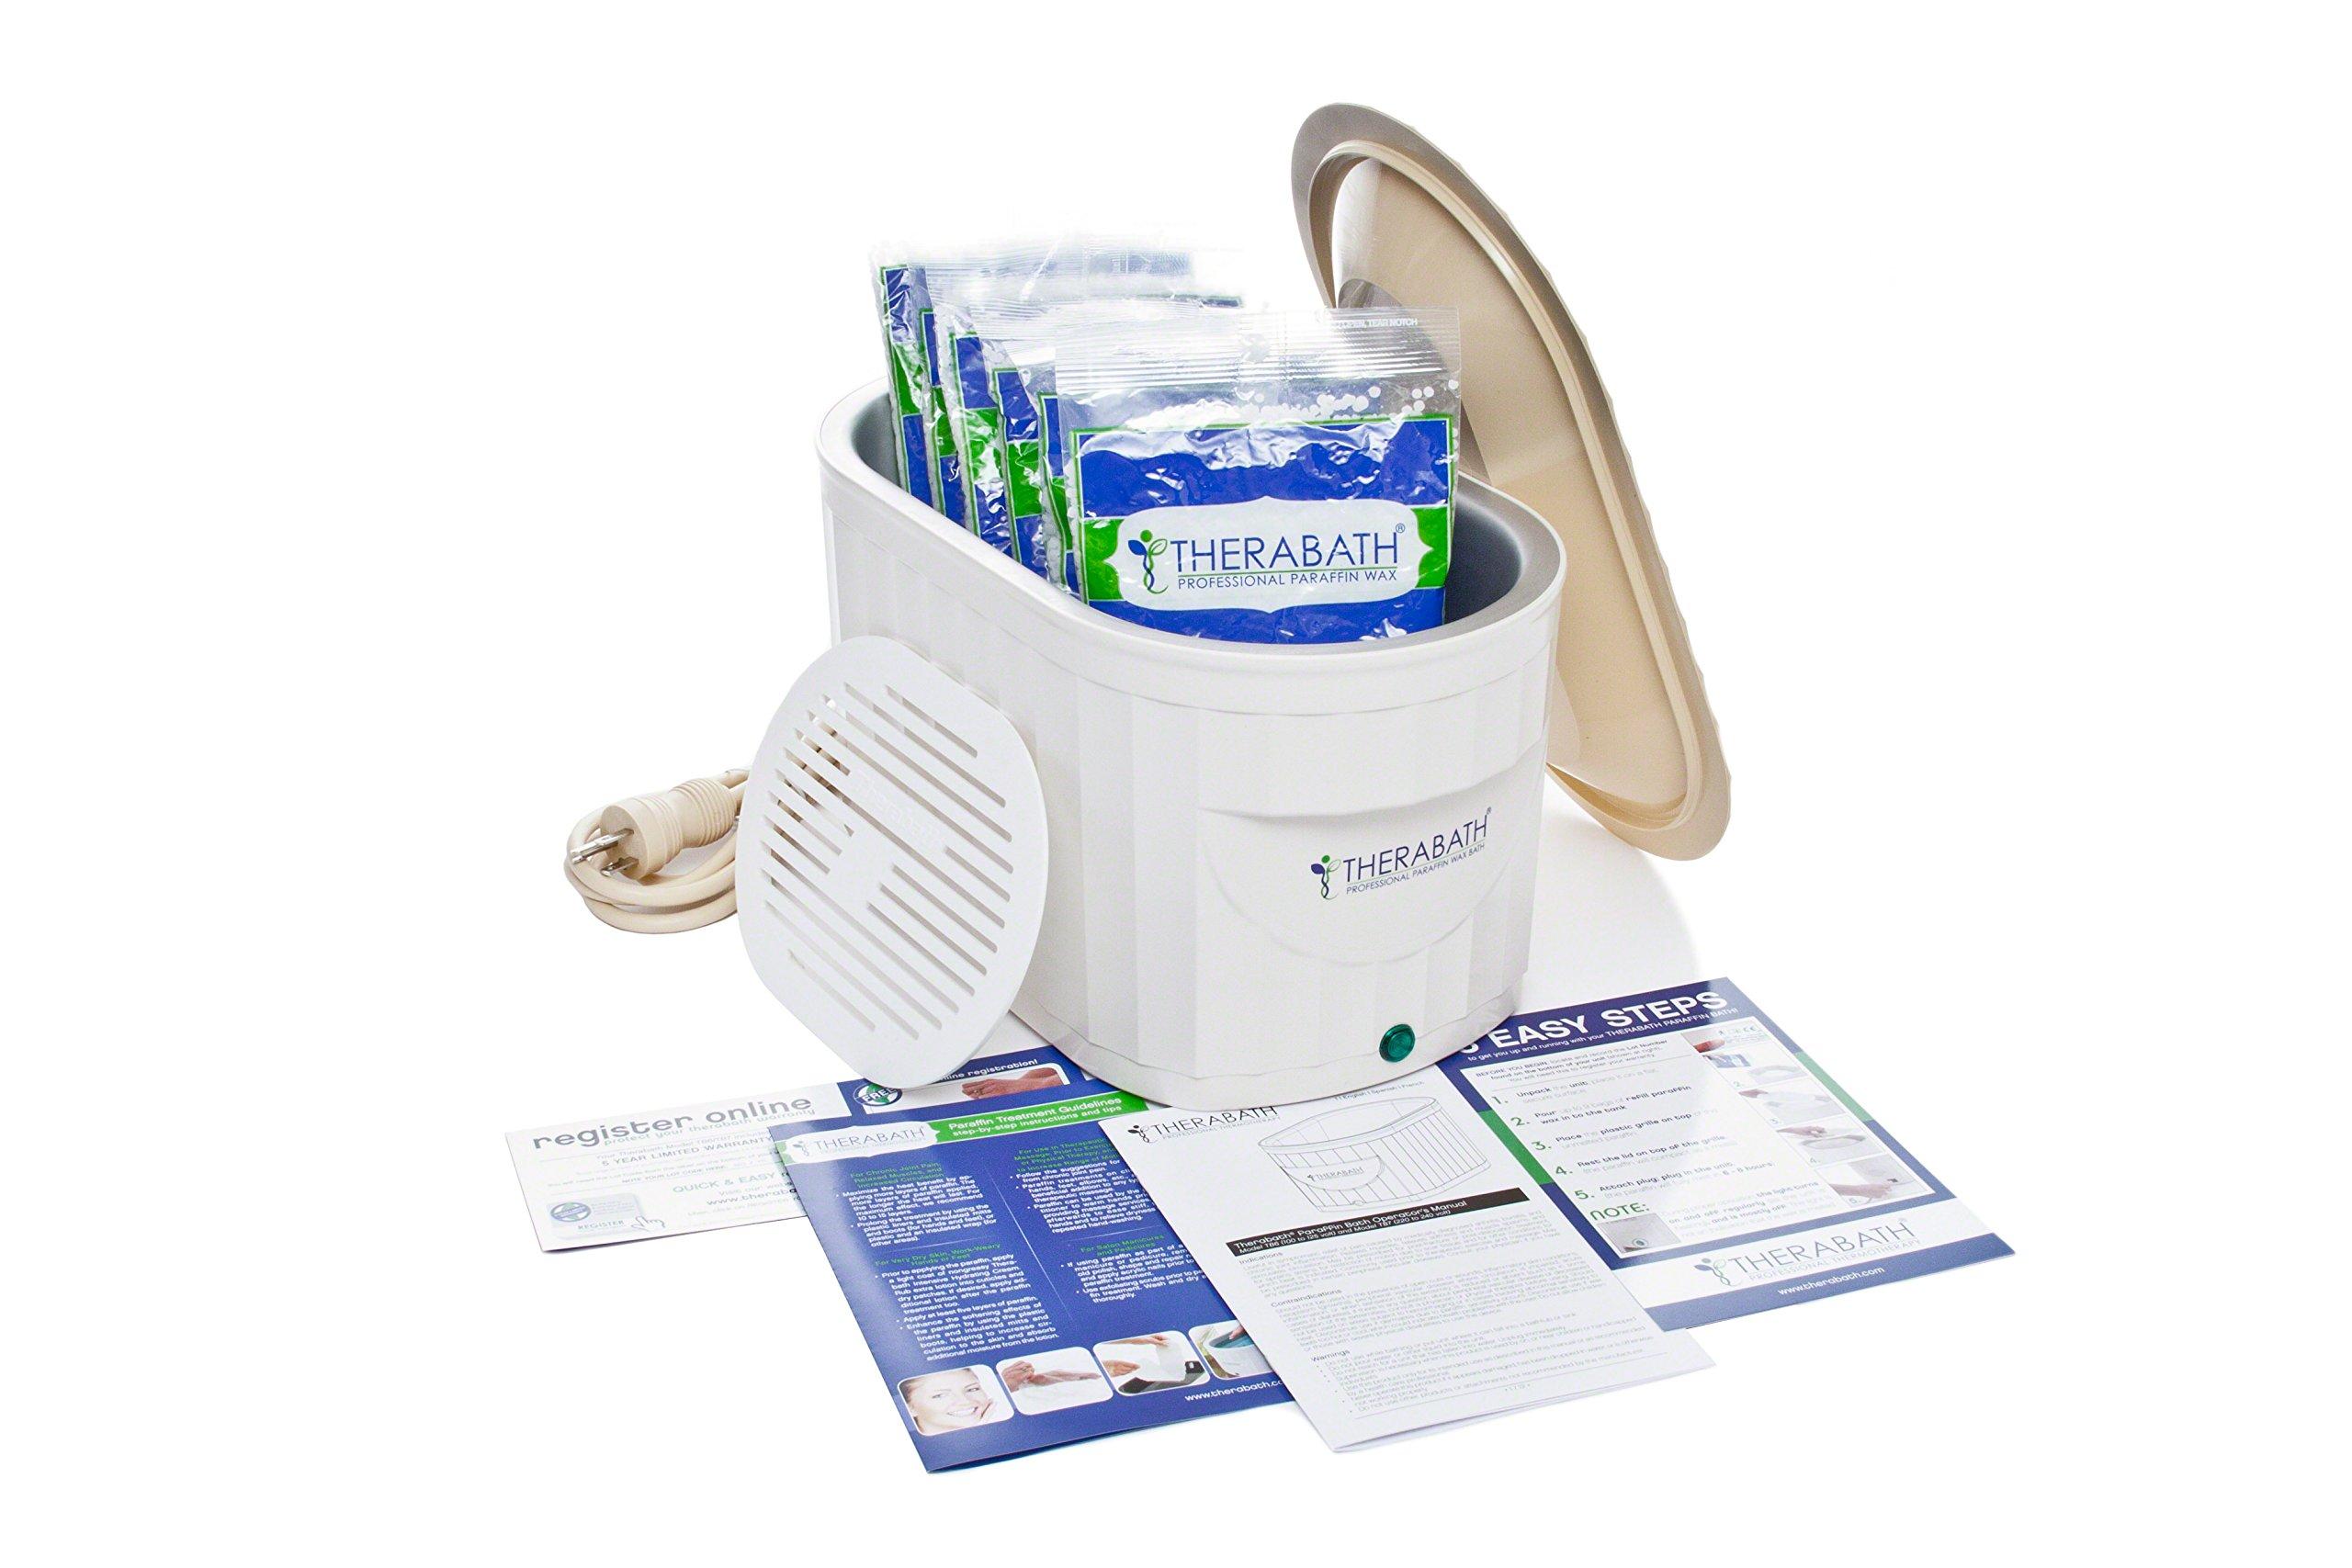 WR Medical Therabath PRO Professional Grade Paraffin Bath - Sku WRM2300